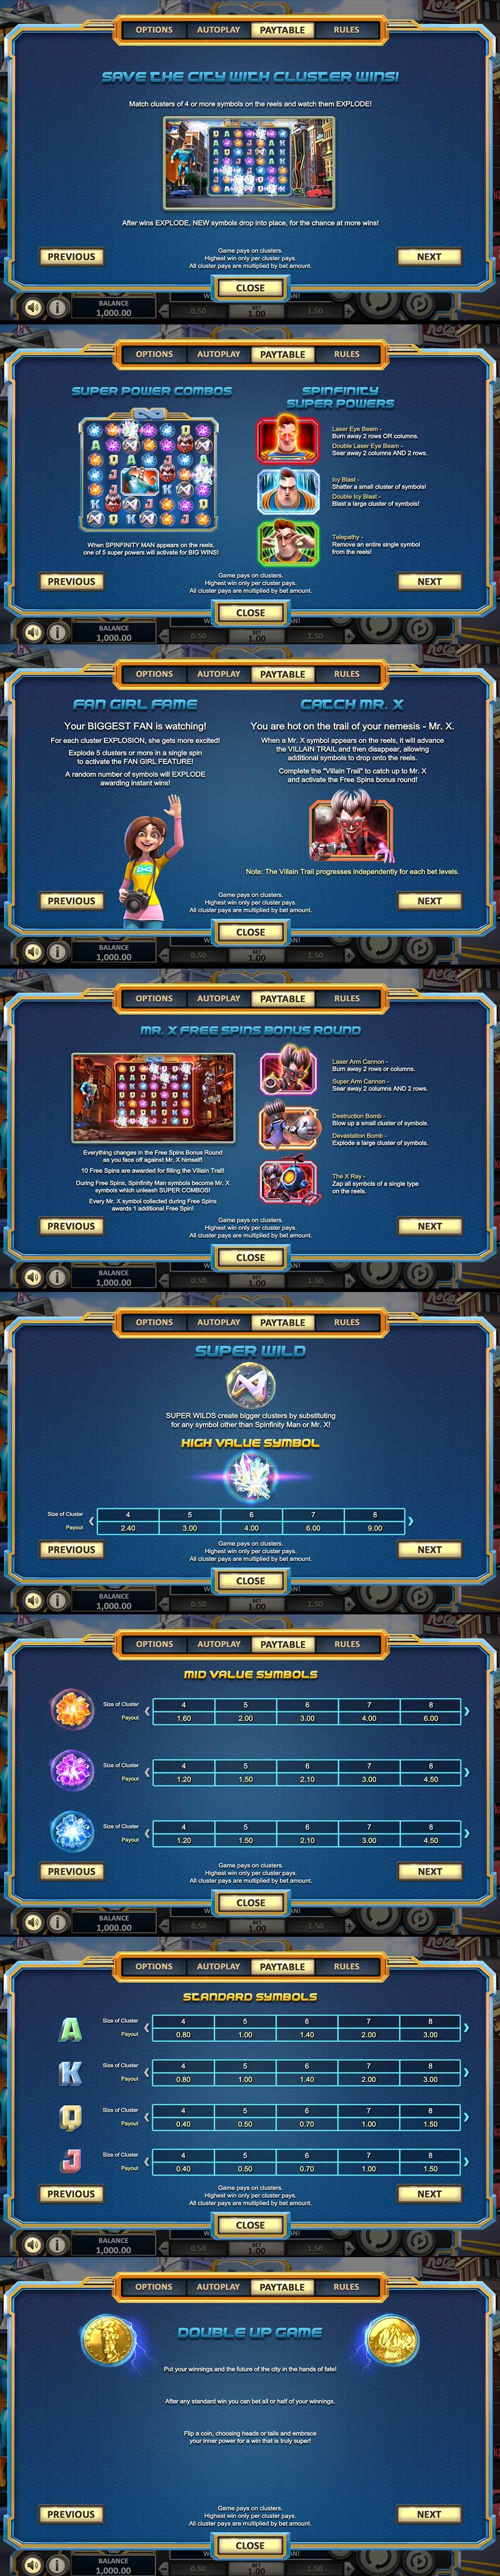 Spinfinity Man Pay Table Screenshot, Big Dollar Casino